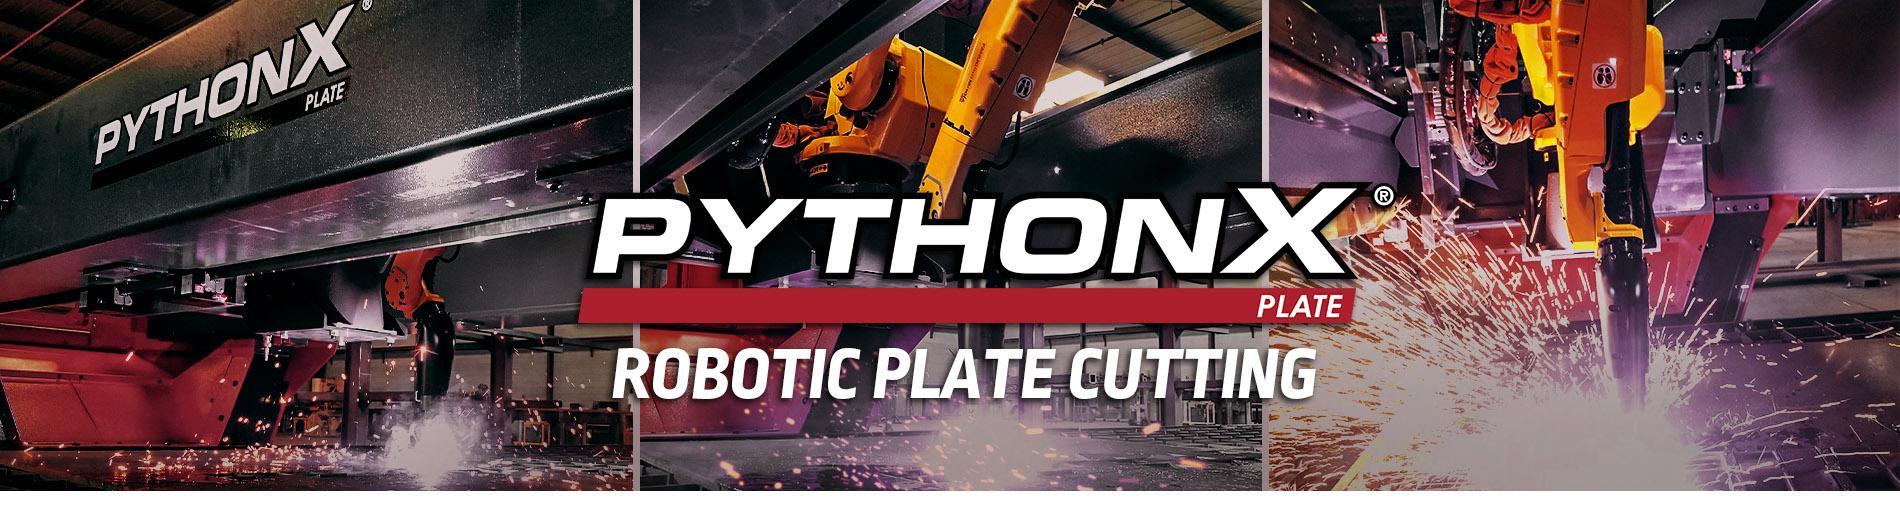 PythonxPlate